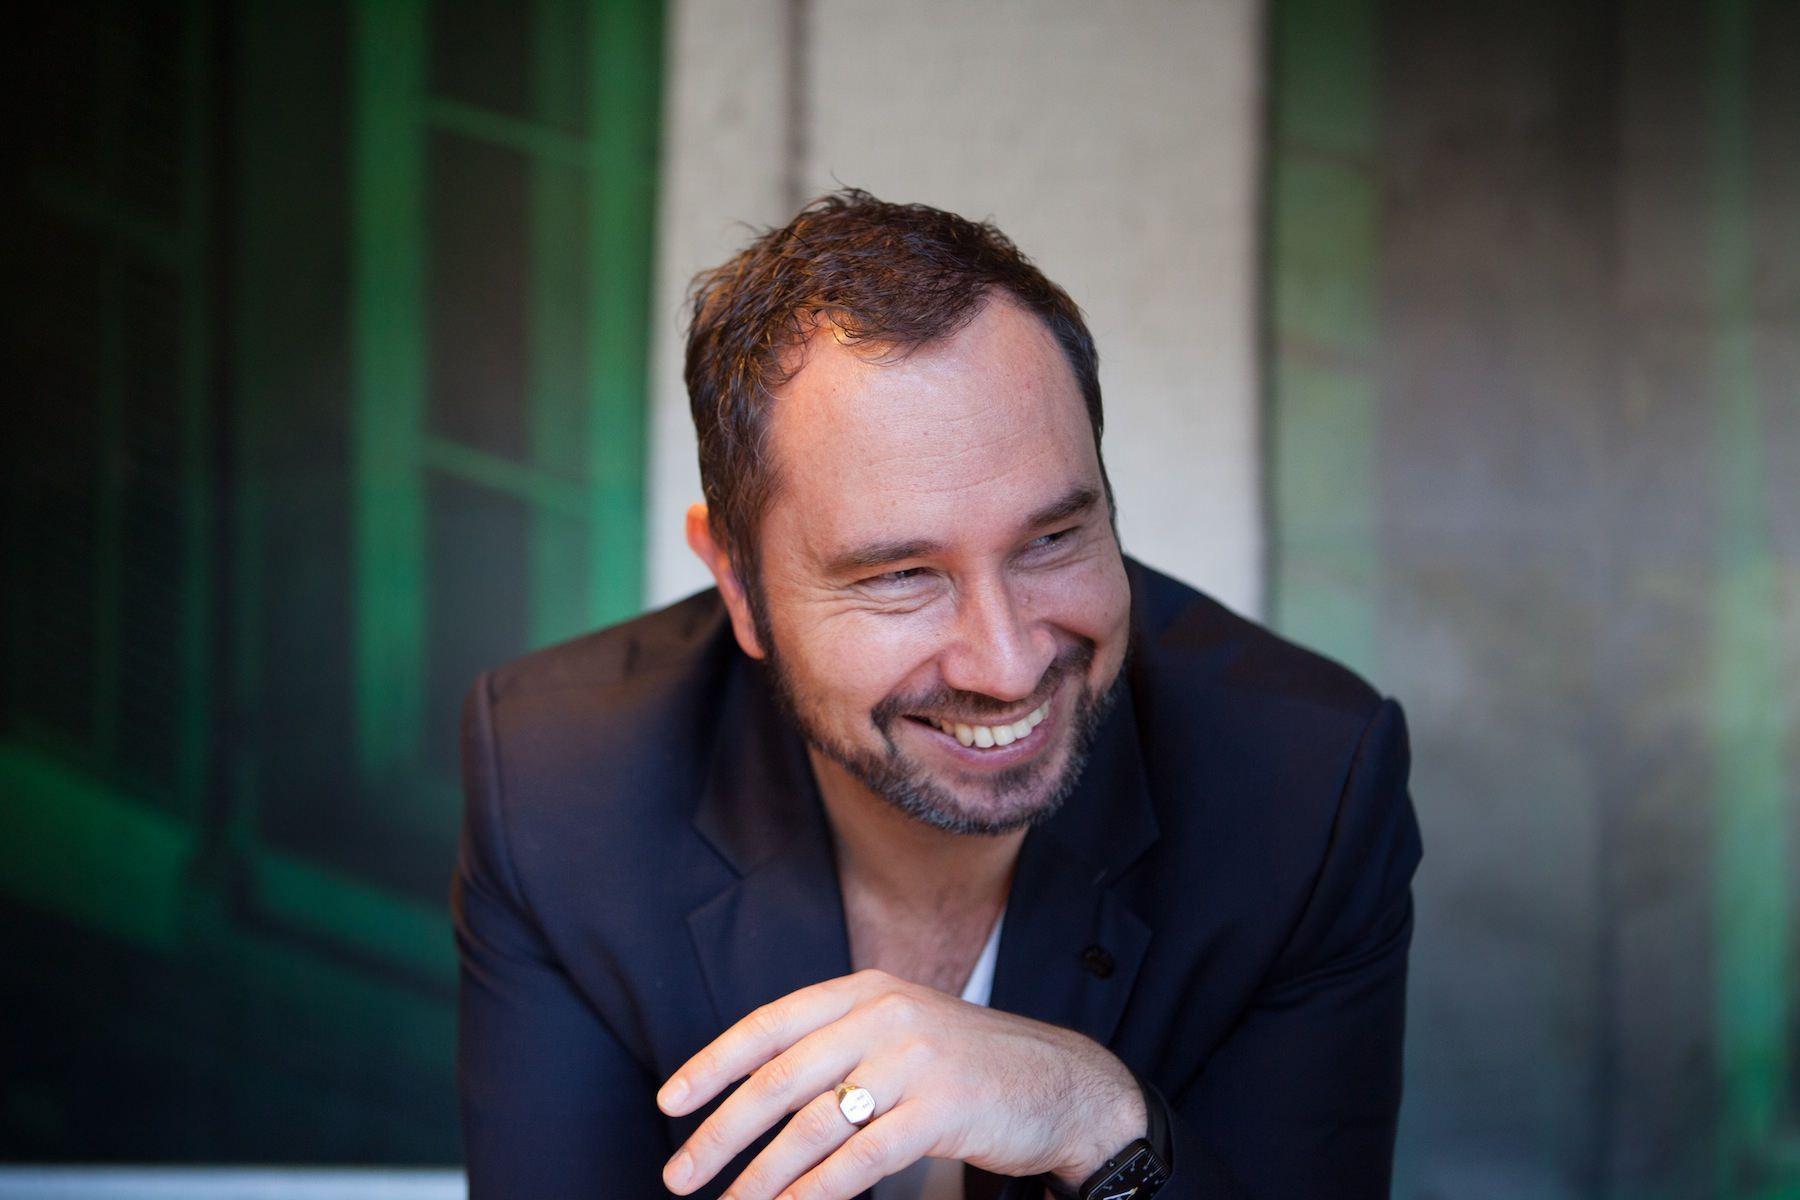 Interior Design's 10 Questions With.... Alain Gilles Ligne Roset